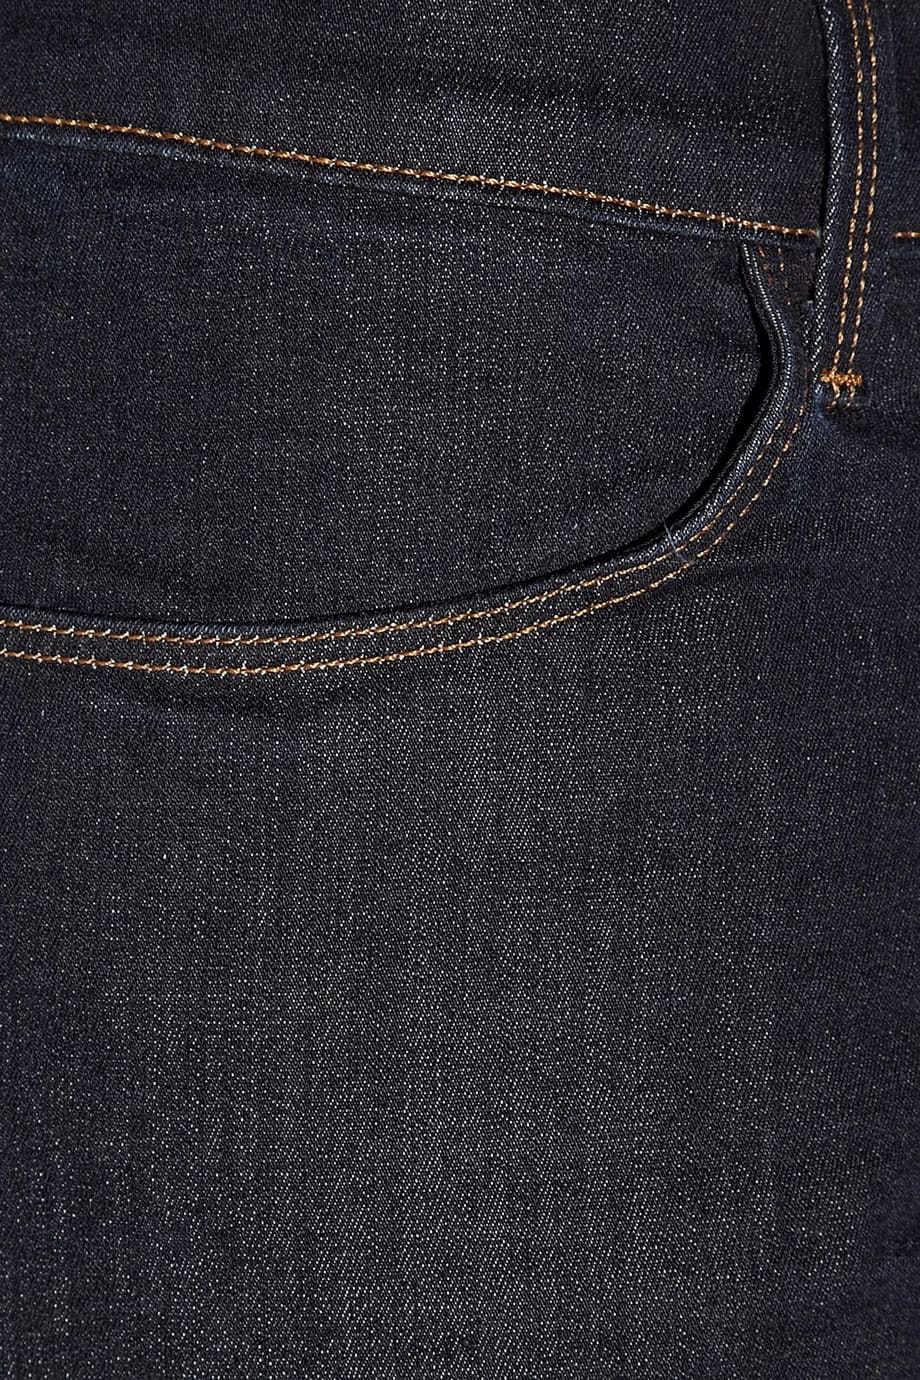 image Arborer le look de (Black Widow) Natasha Romanoff en jeans J Brand 24